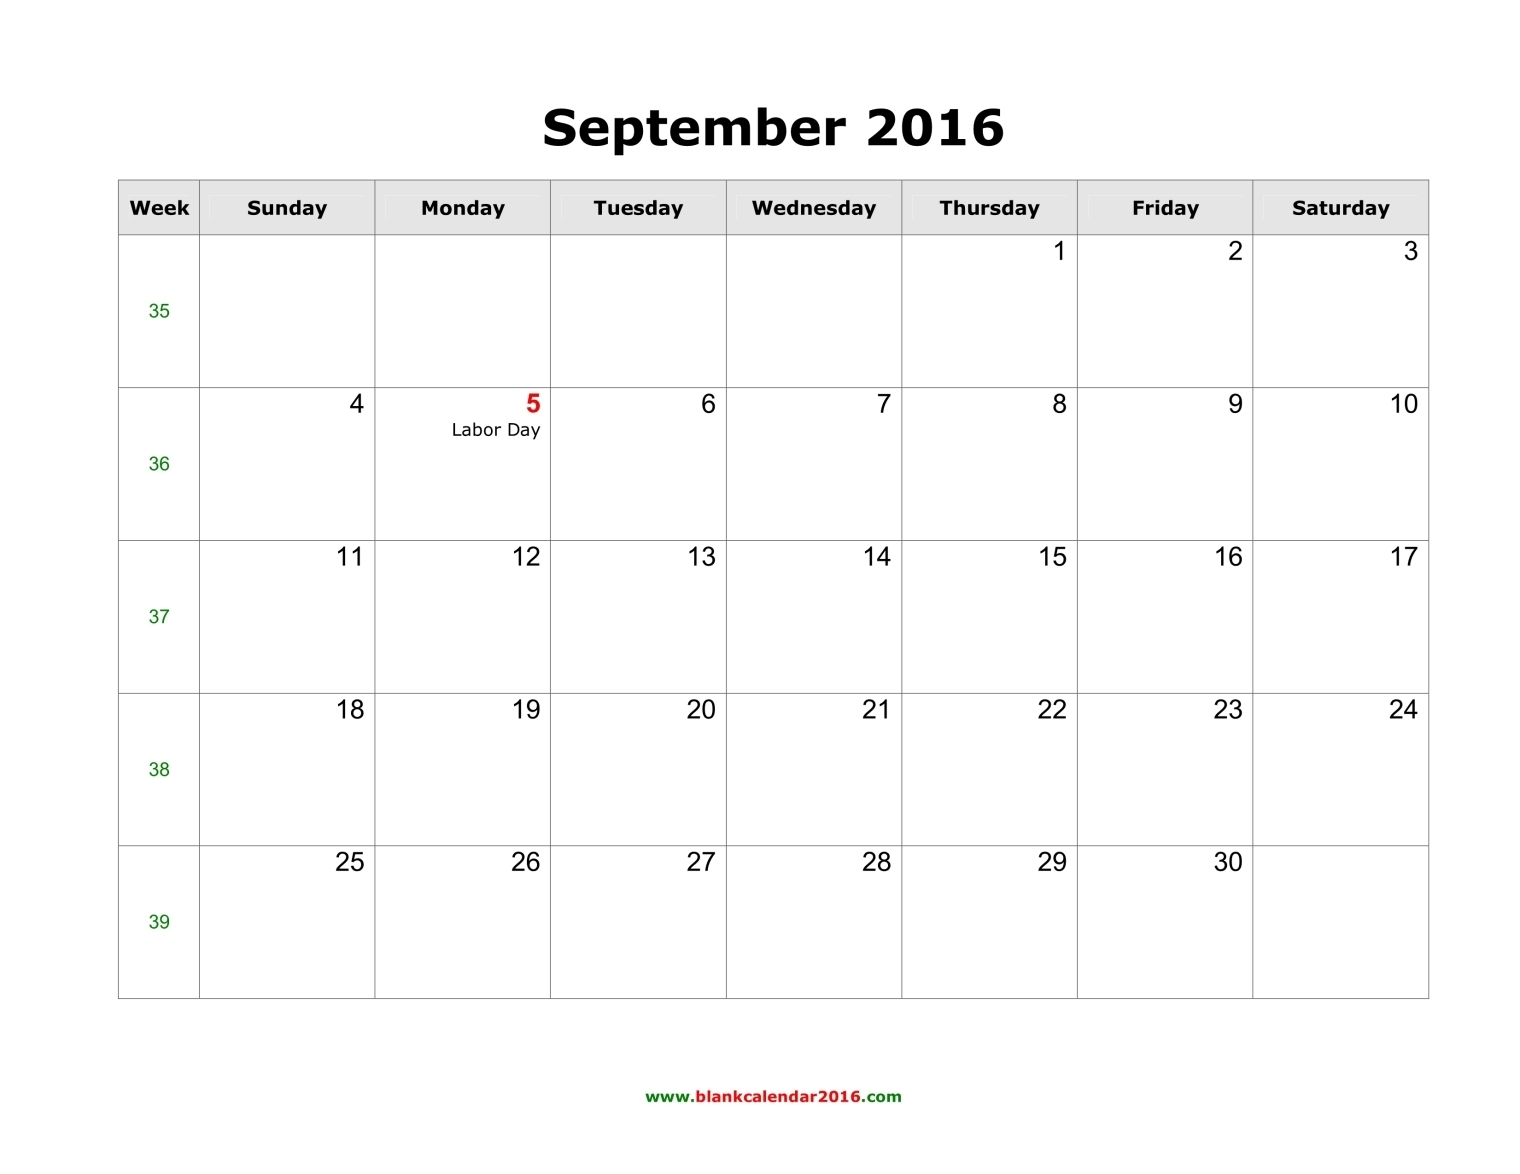 September 2016 Calendar Jewish Holidays » Calendar Holidays